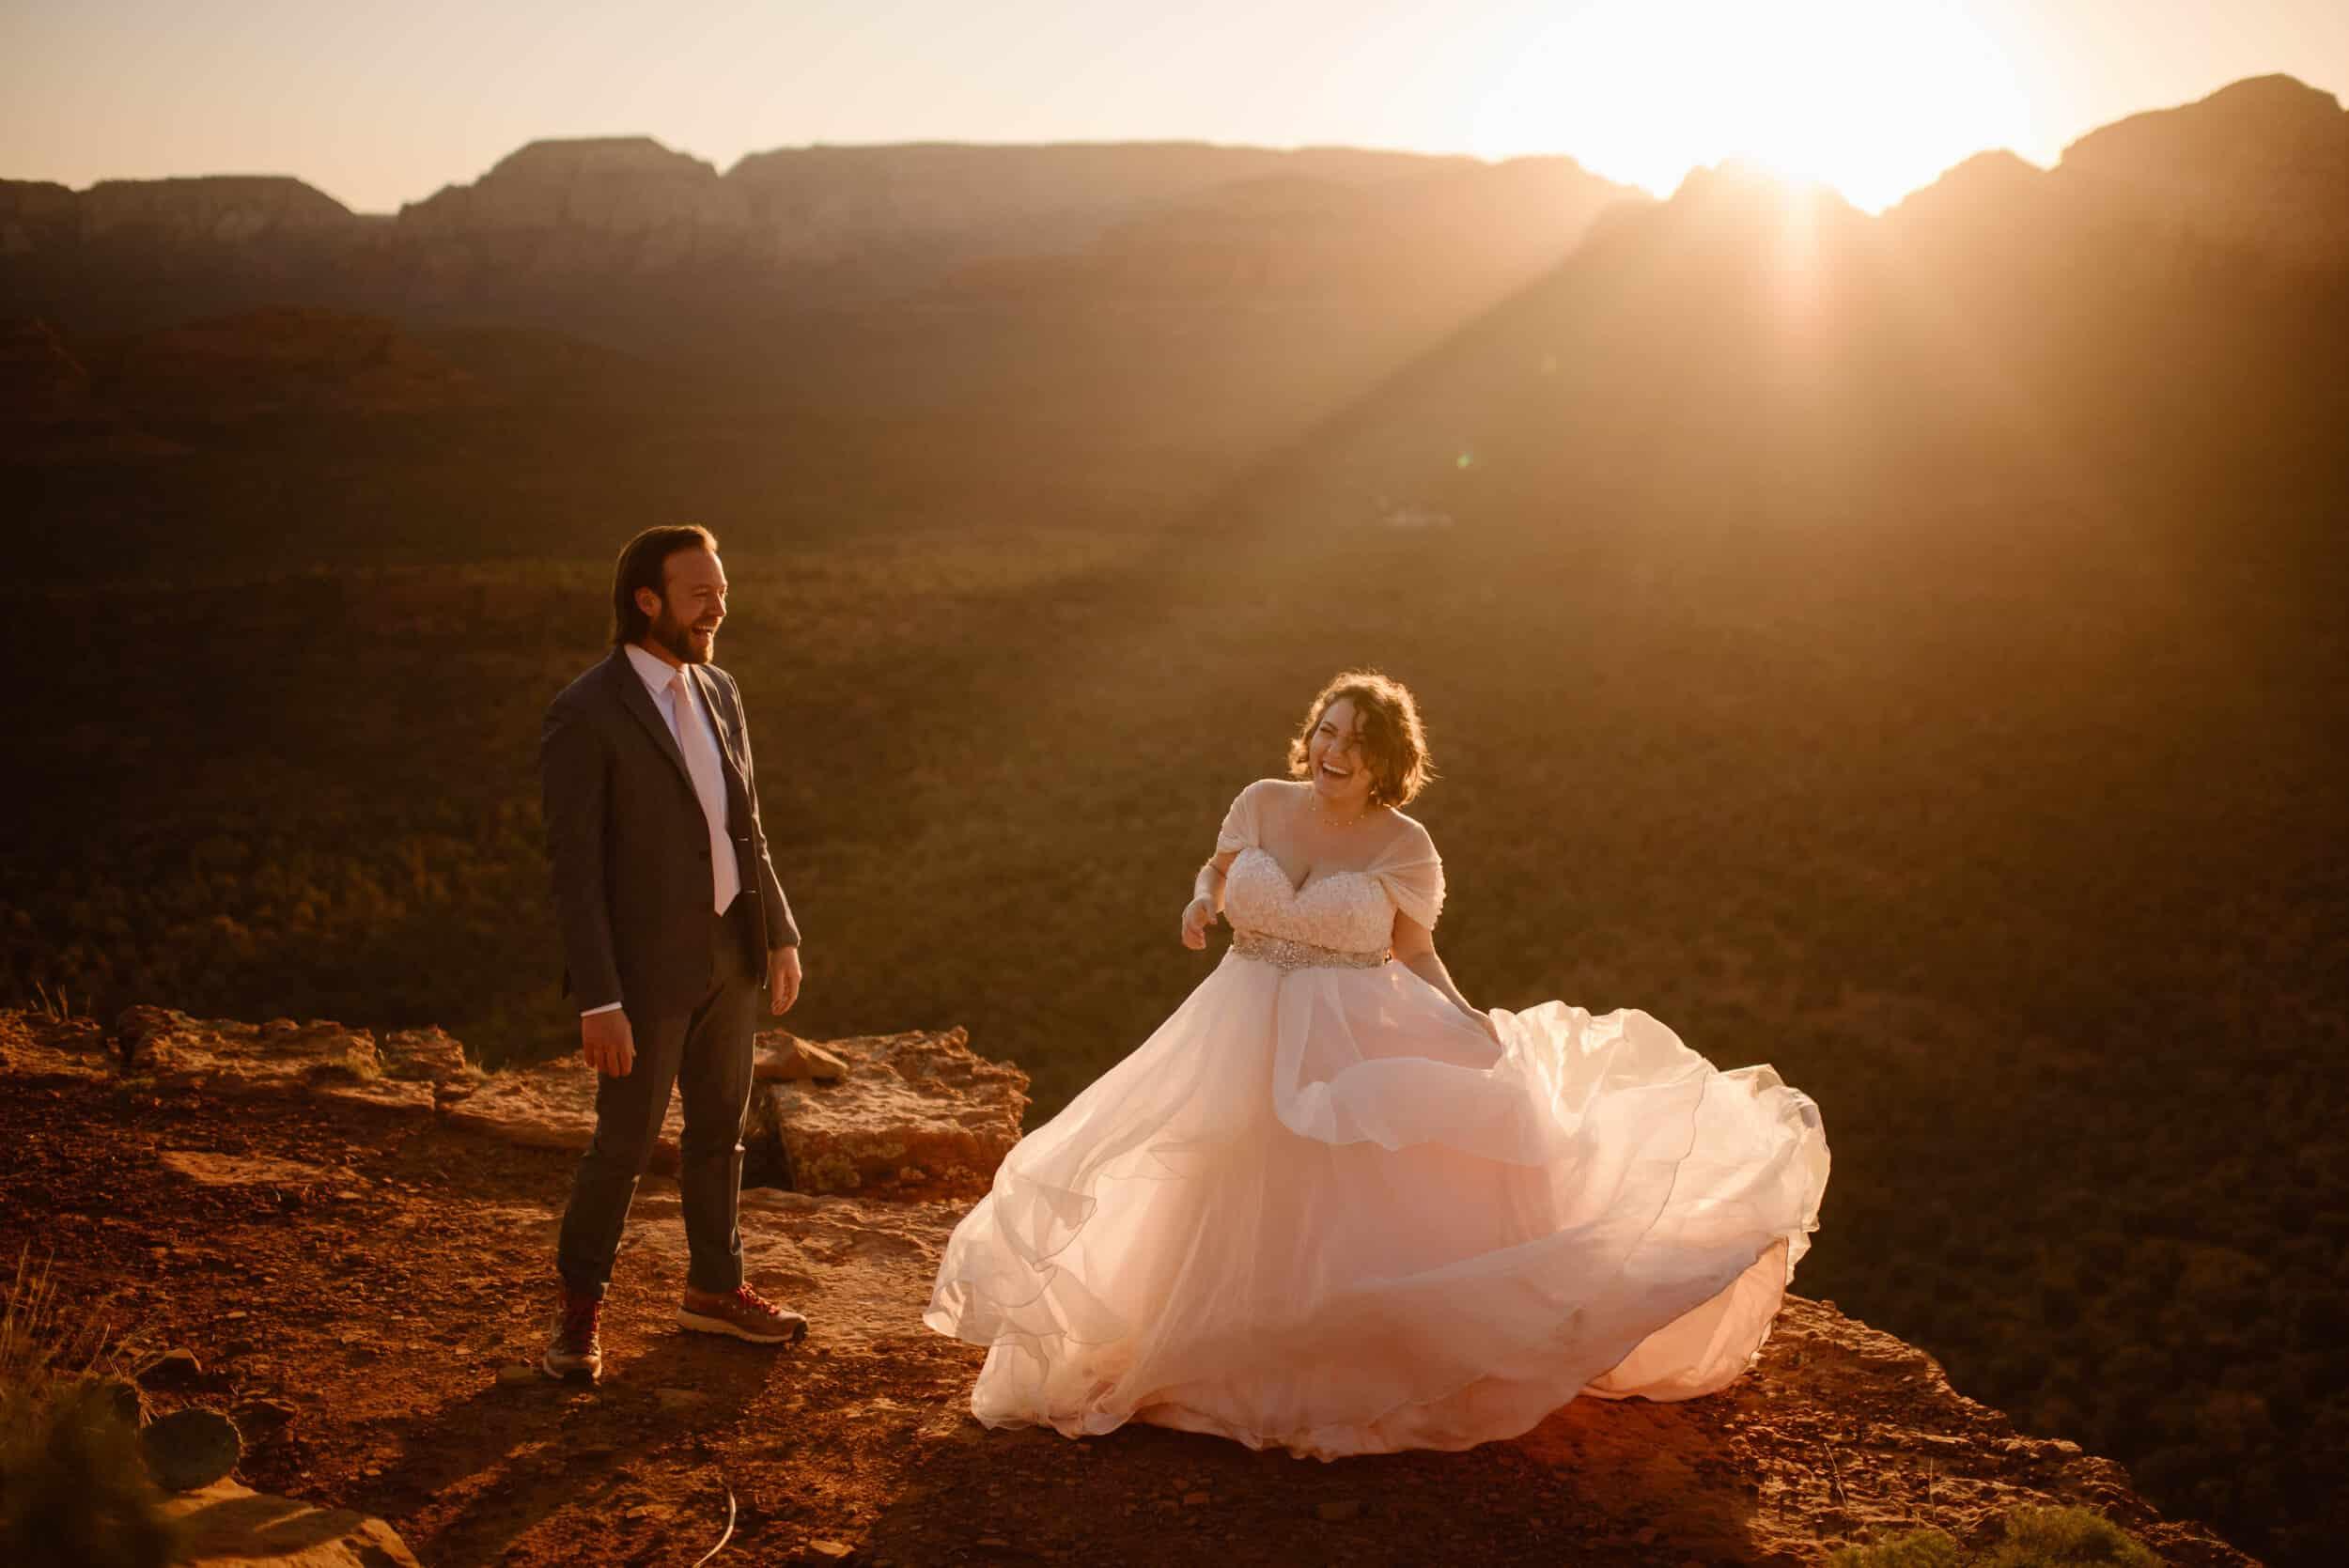 Matt + Alicia - Adventure + Vow Elopement Photographer-77.jpg